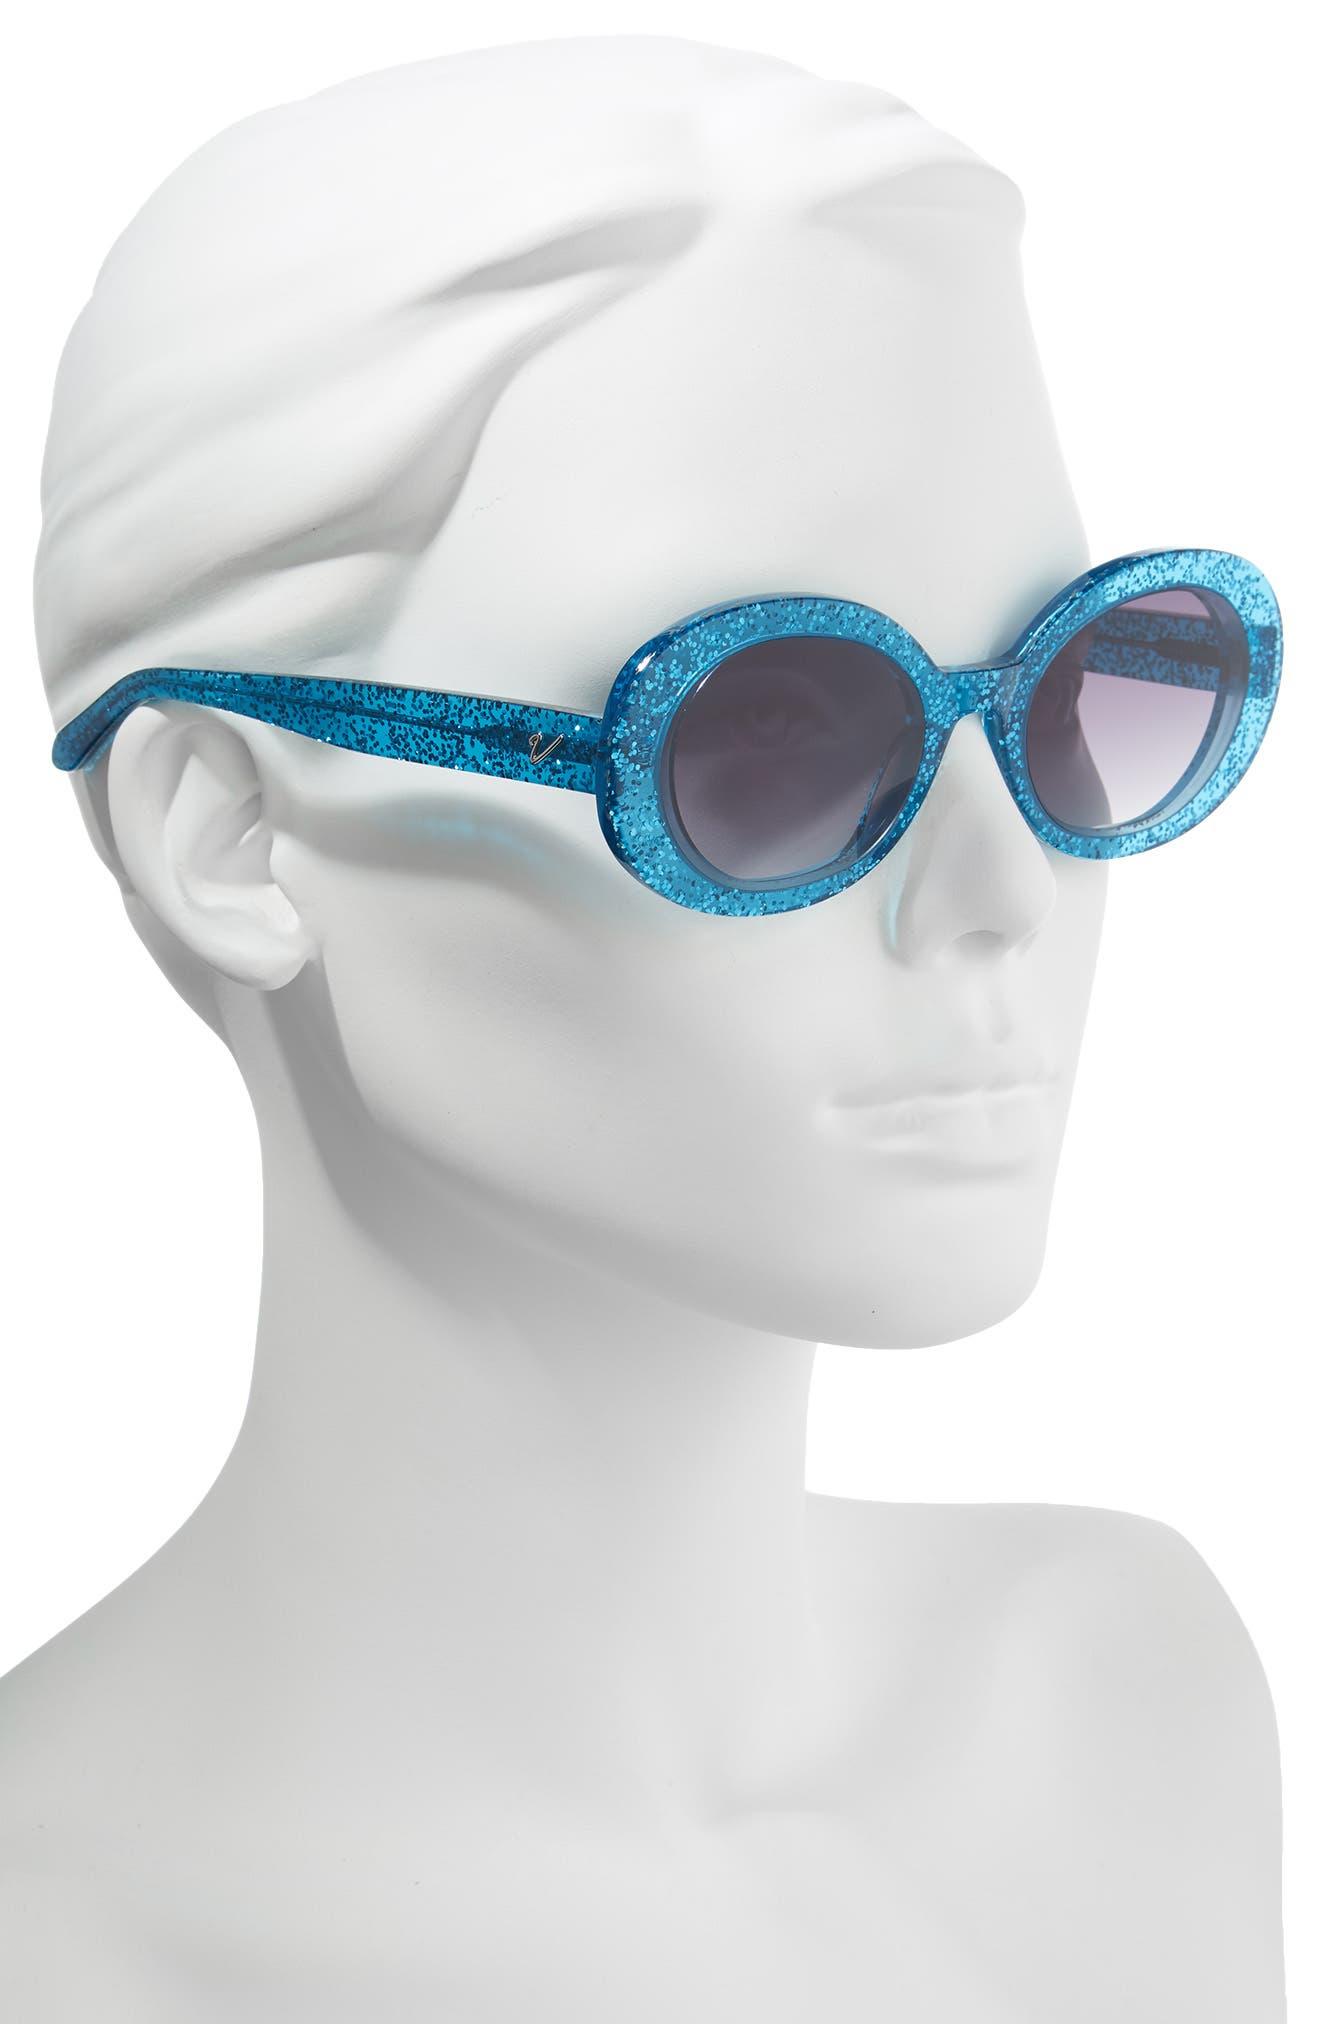 Selena 53mm Oval Sunglasses,                             Alternate thumbnail 2, color,                             BLUE GLITTER/ SMOKE